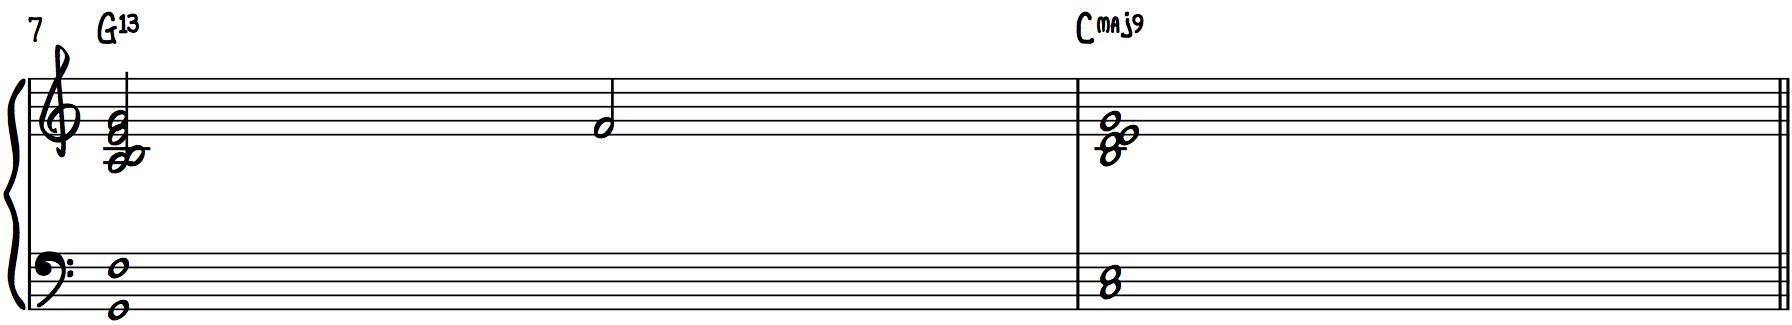 Stock Chords (13th Chords) harmonize chord progression